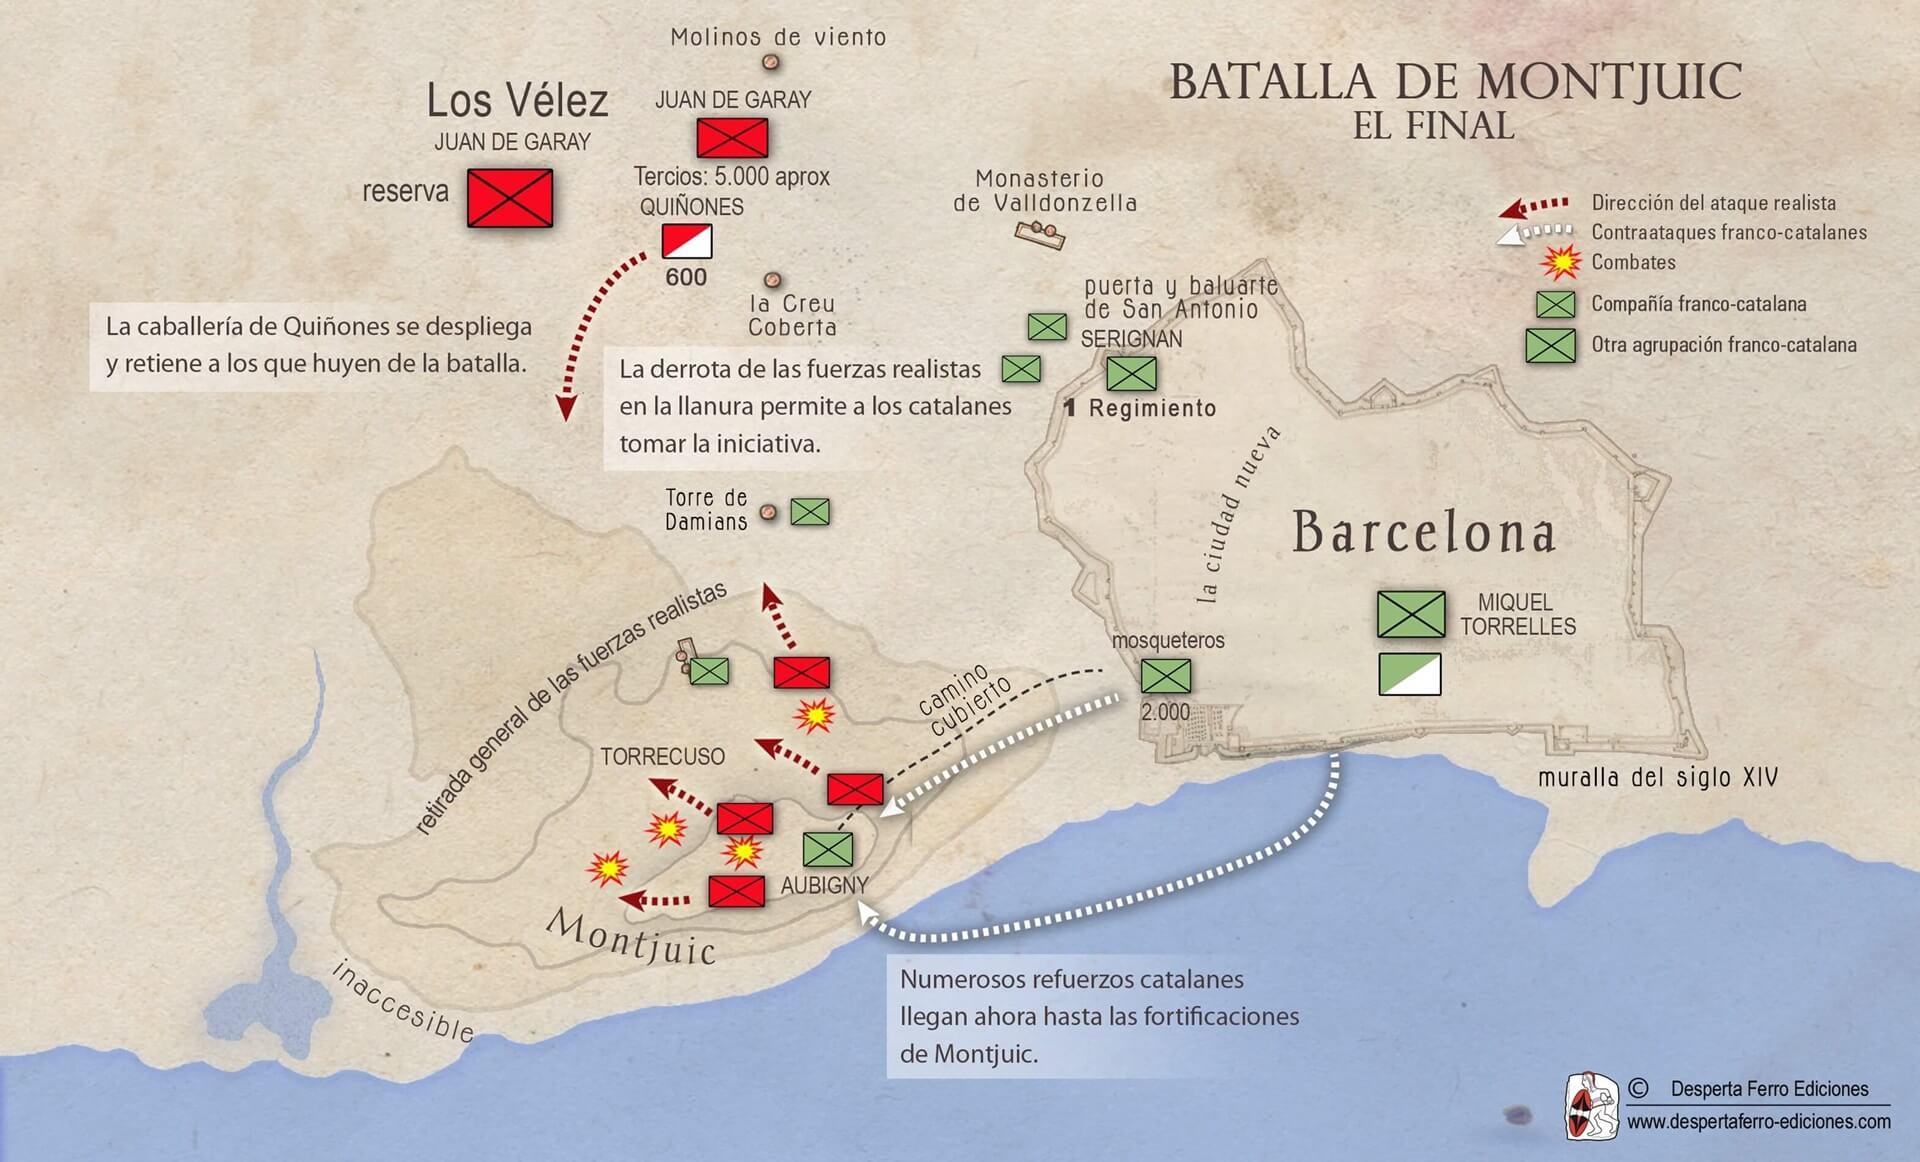 La batalla de Montjuic mapa